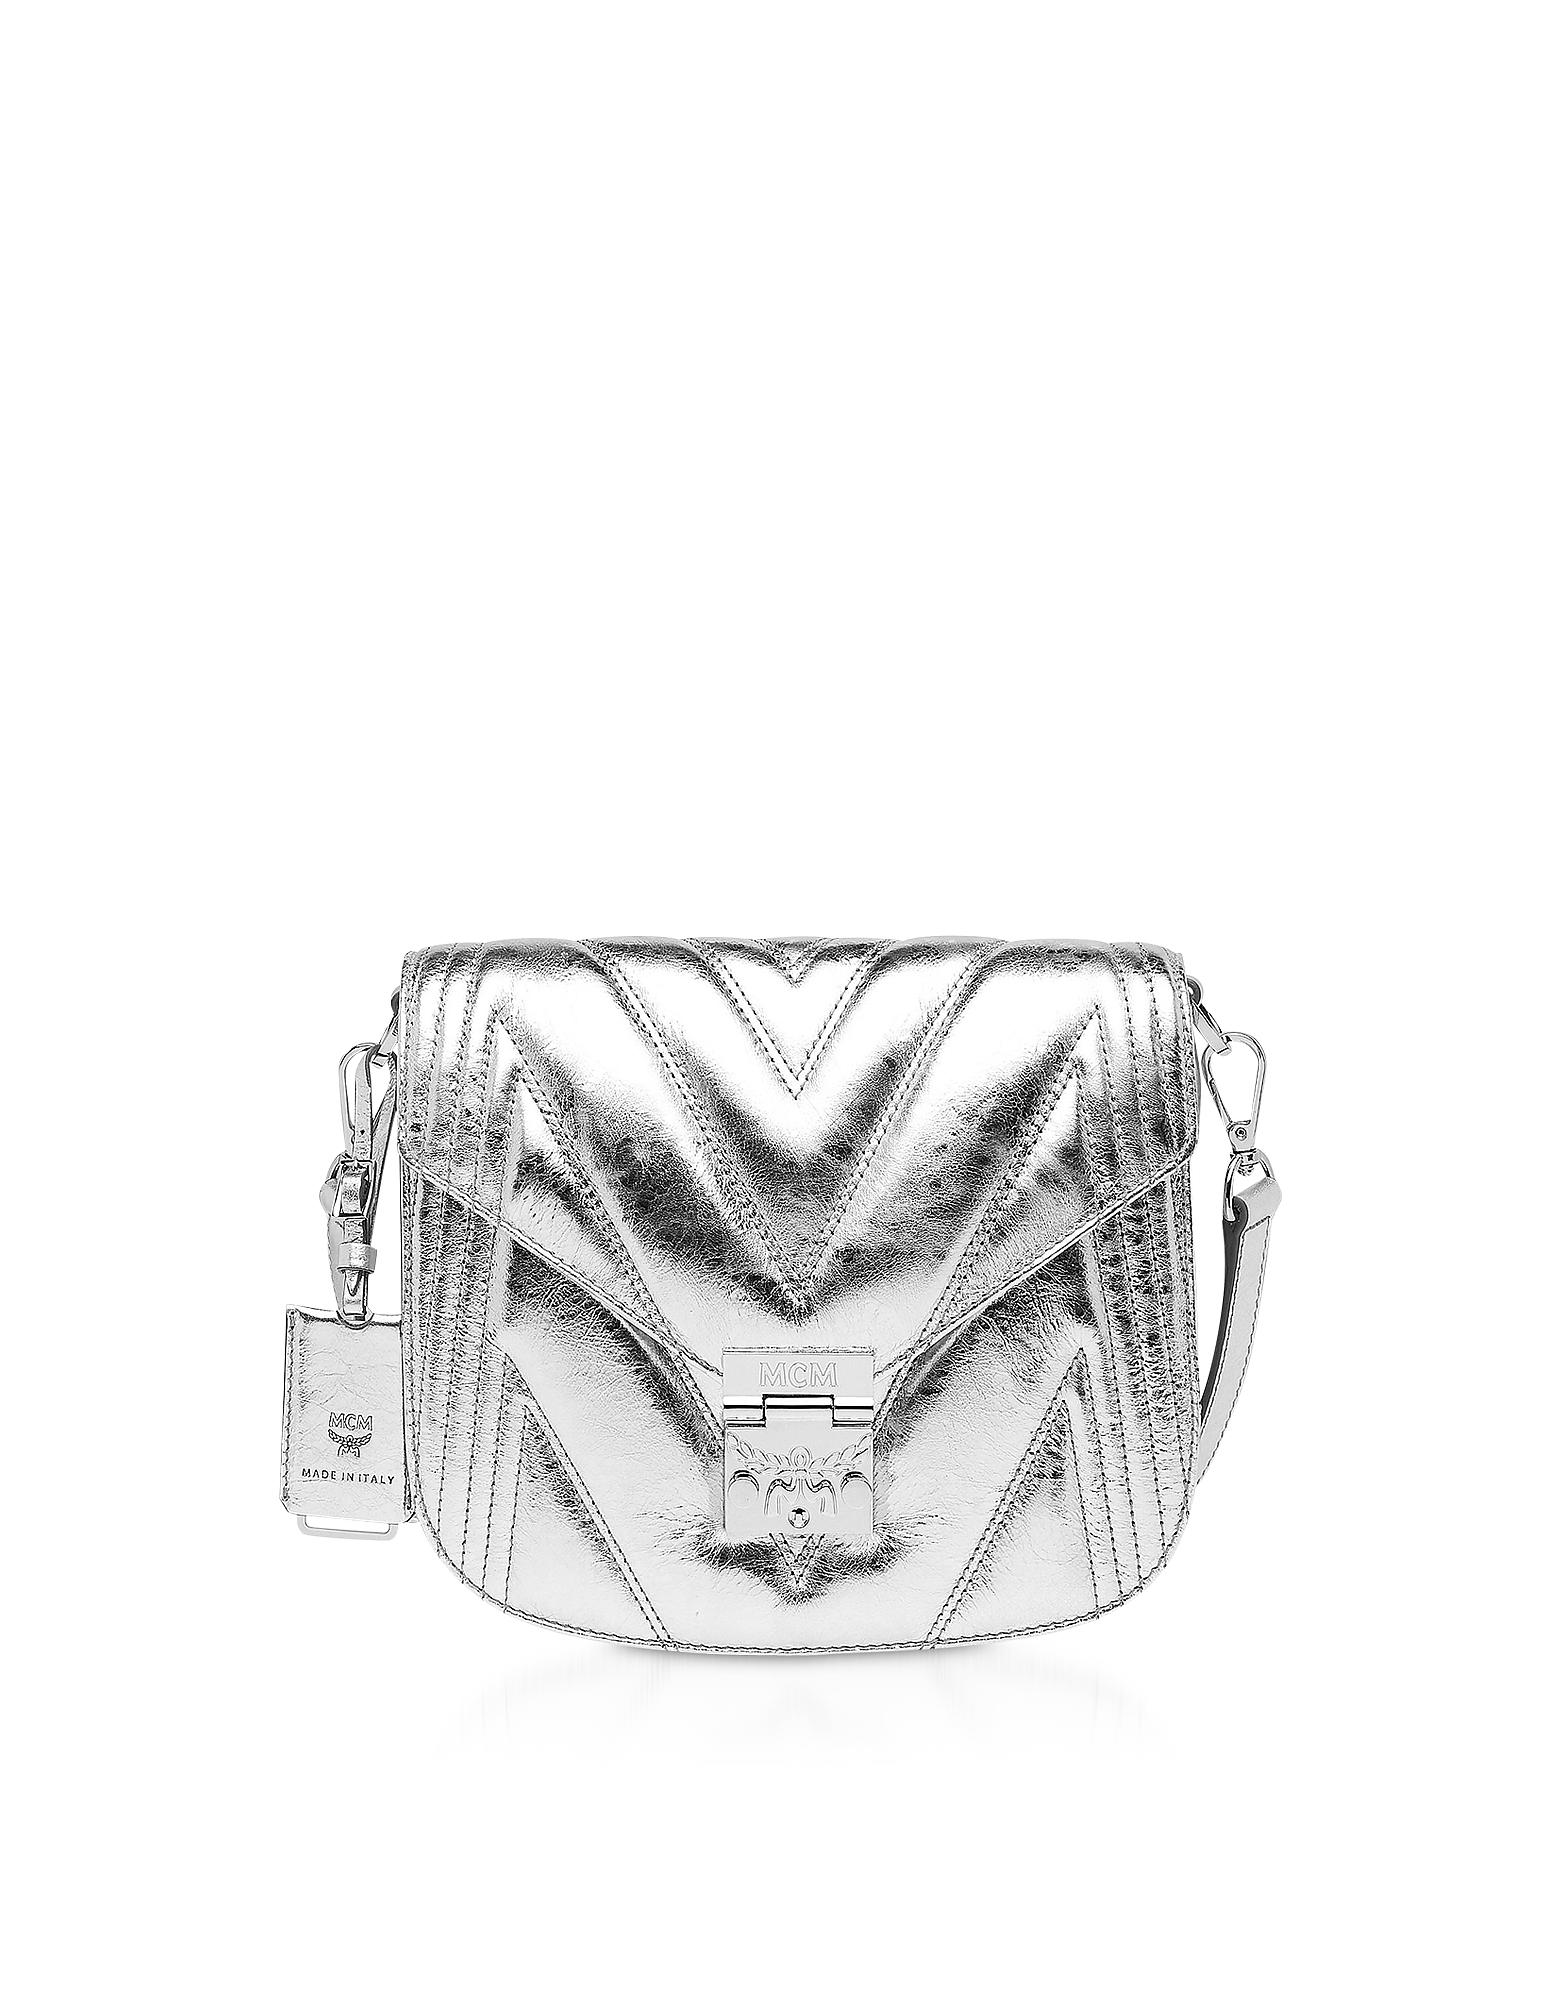 MCM Designer Handbags, Quilted Metallic Leather Patricia Shoulder Bag